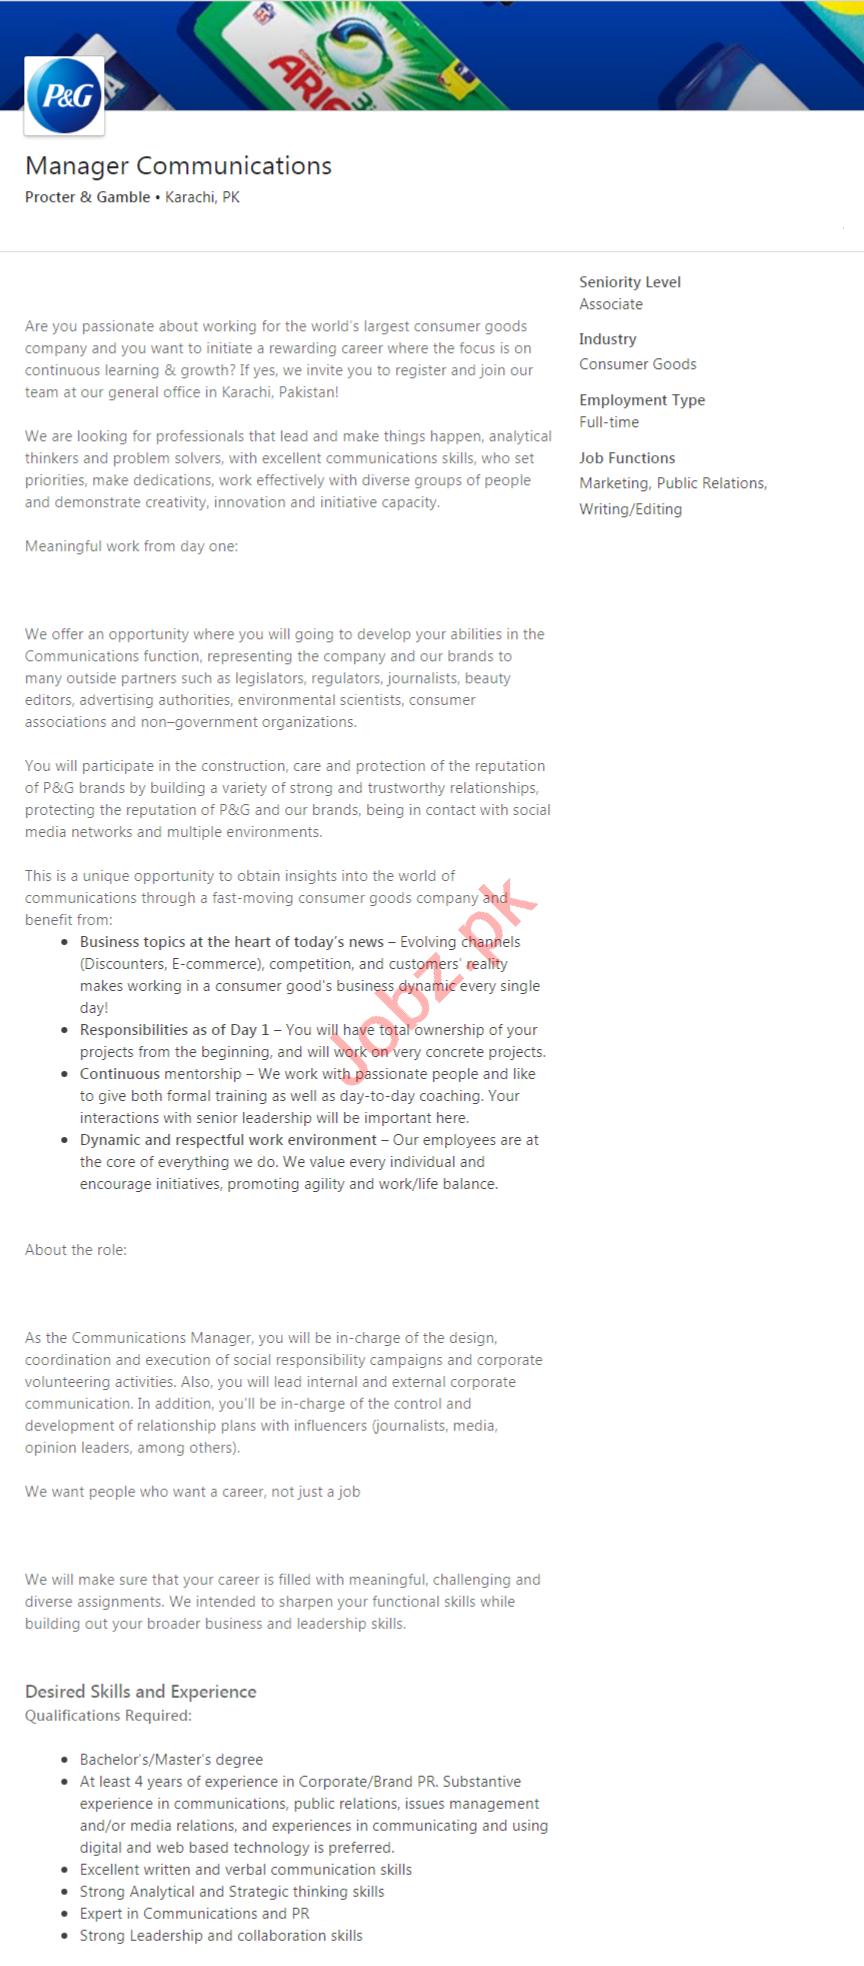 Procter & Gamble Pakistan Jobs 2020 Manager Communications